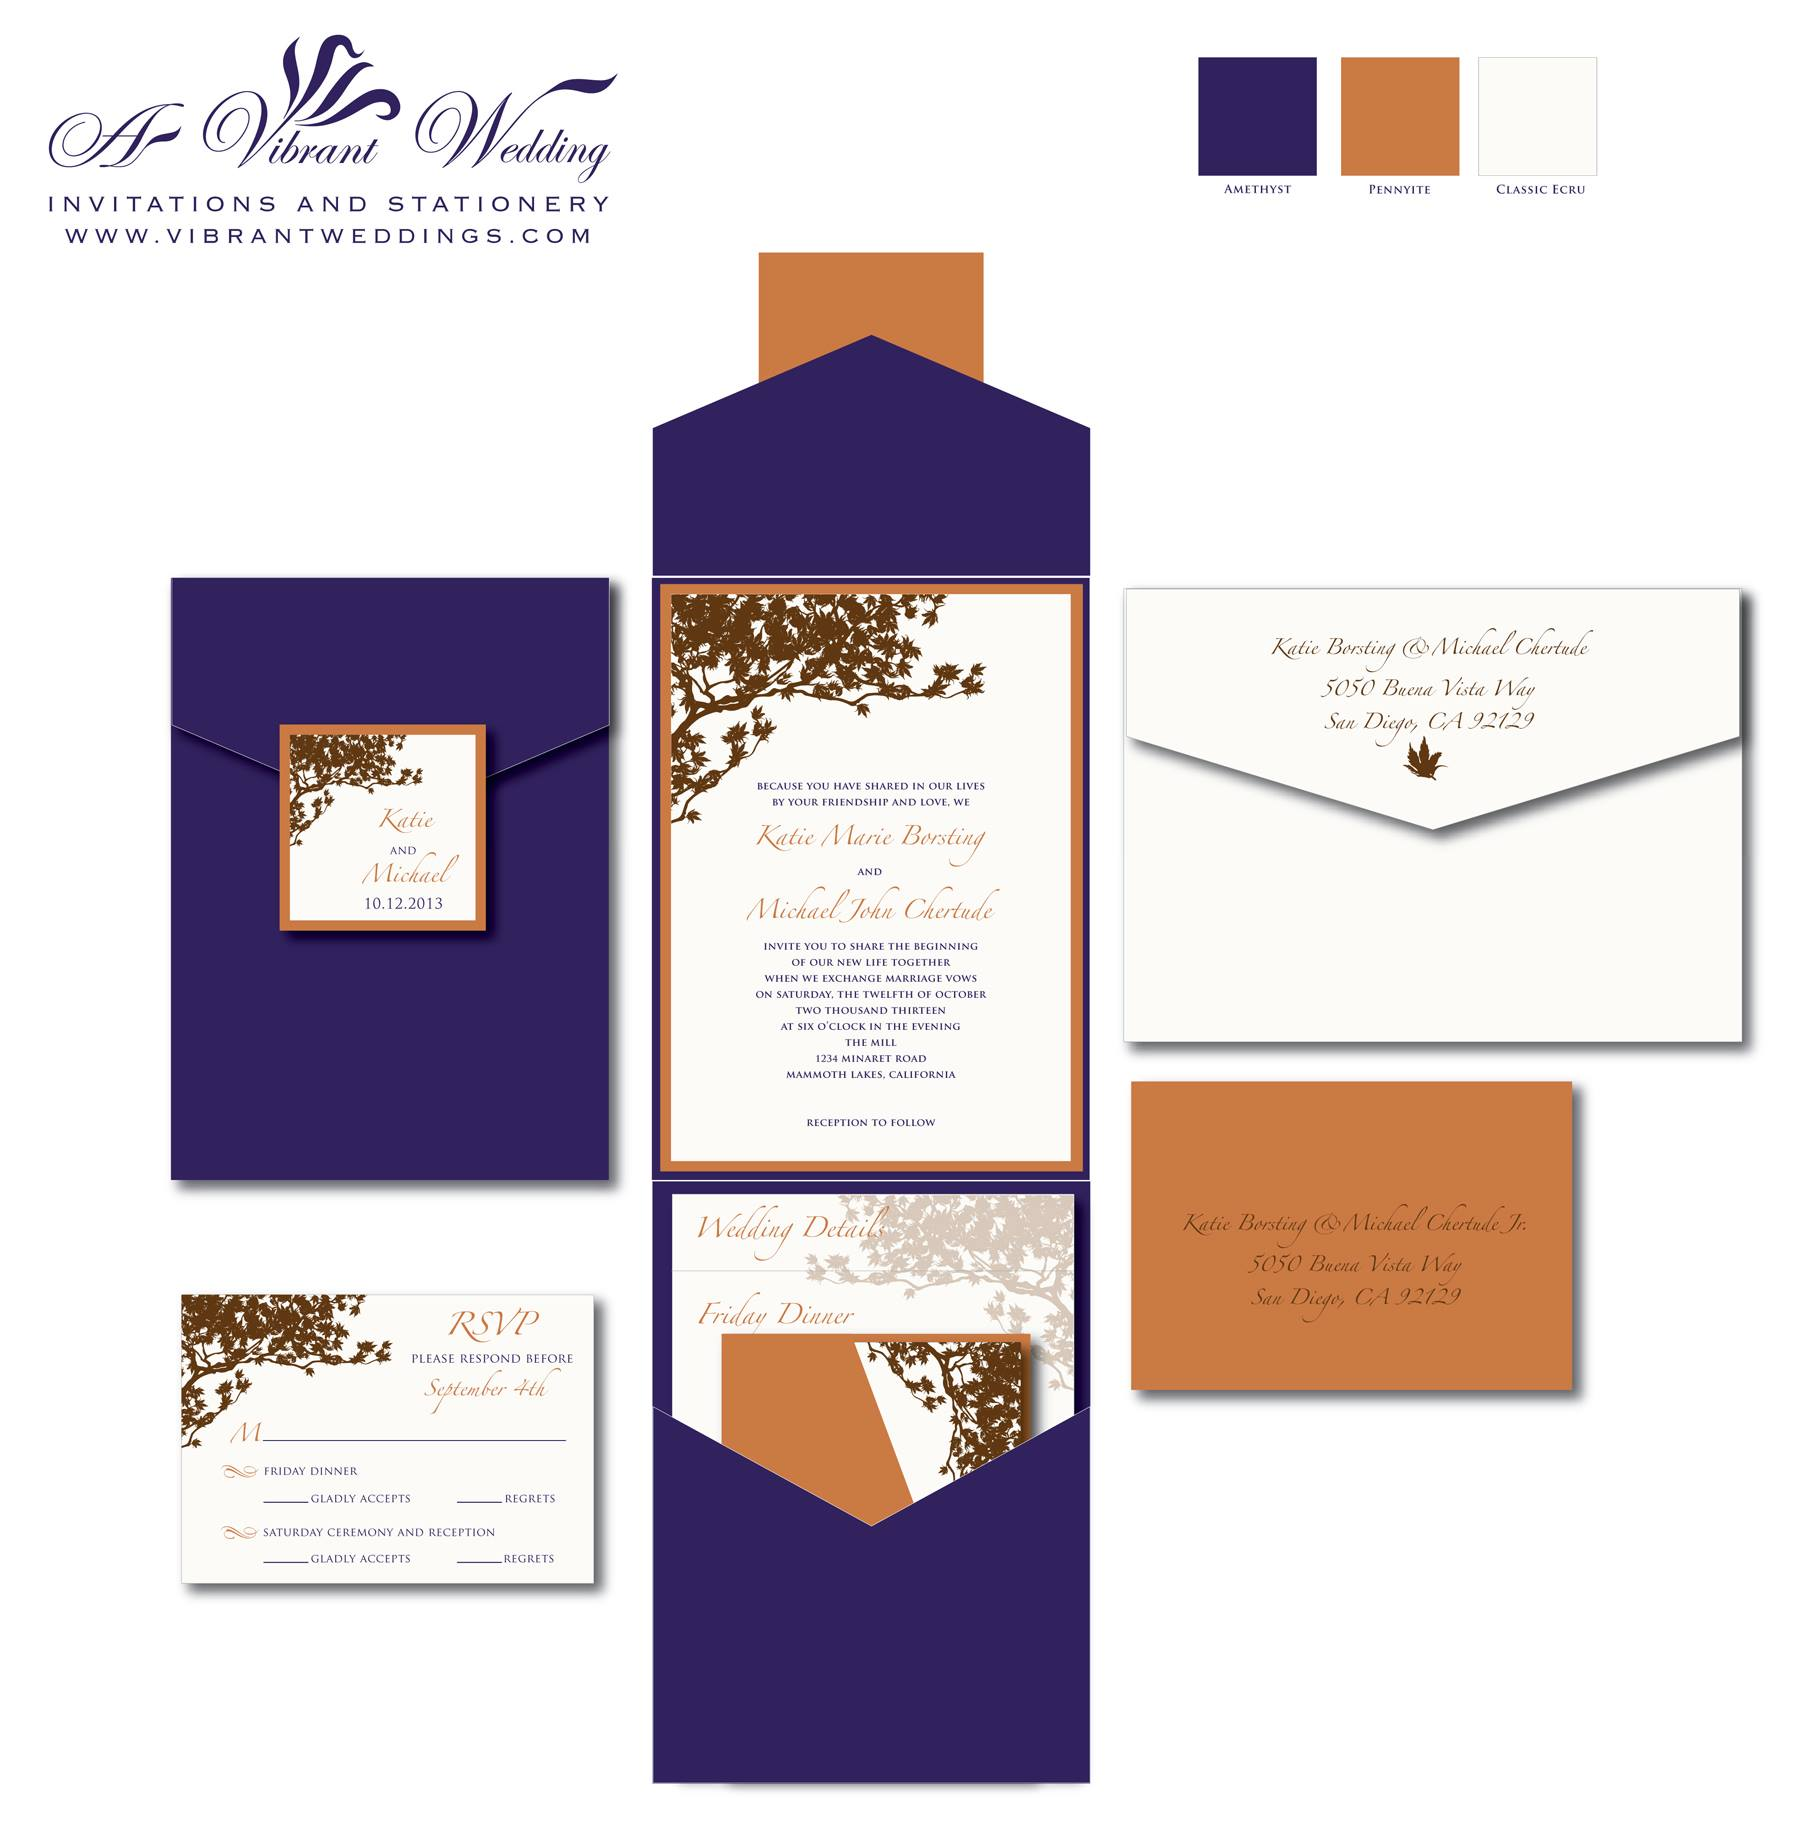 Blue And Orange Wedding Invitations as luxury invitation layout